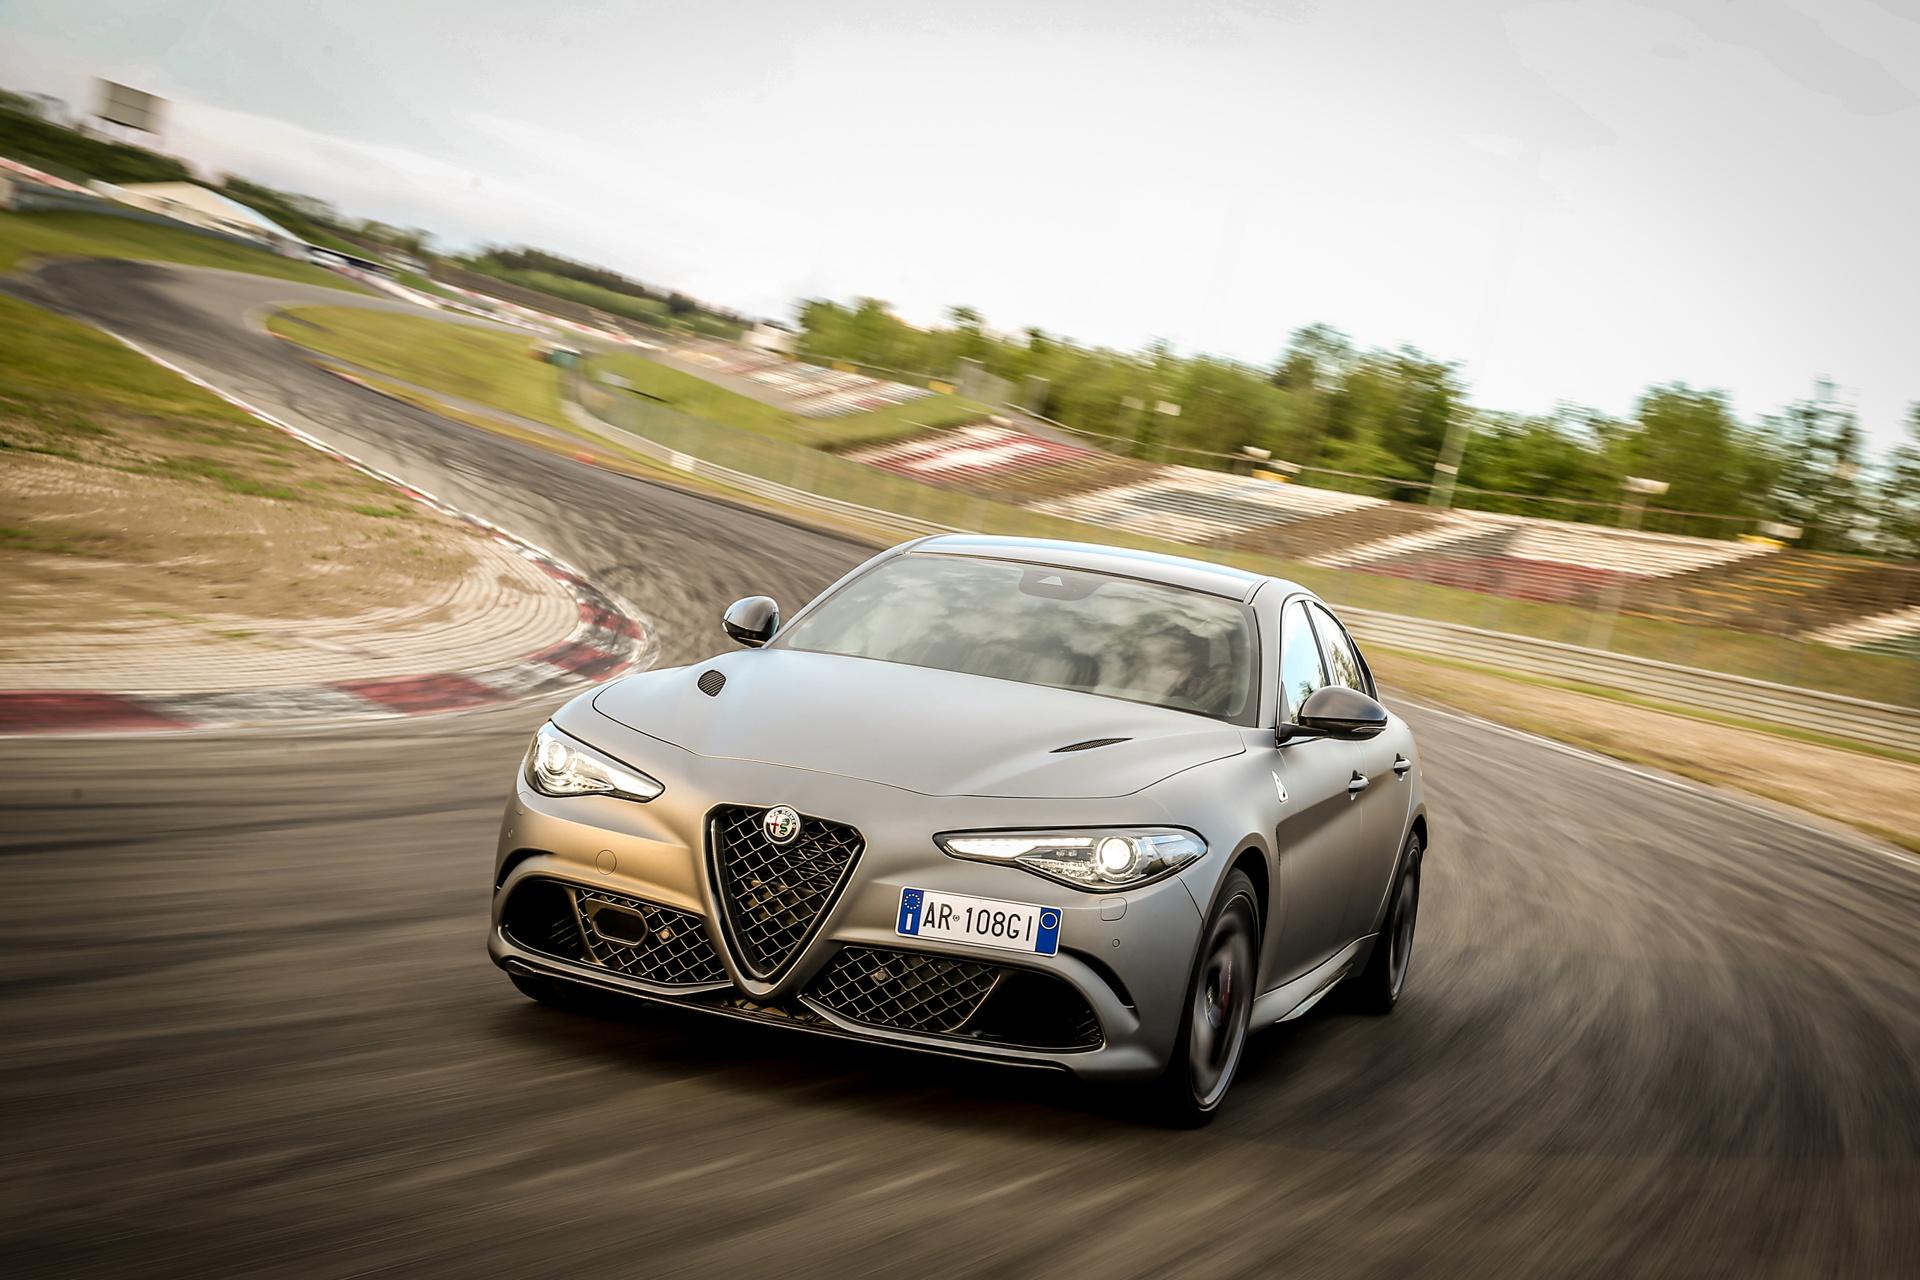 180614_Alfa-Romeo_ORAX5865.jpg